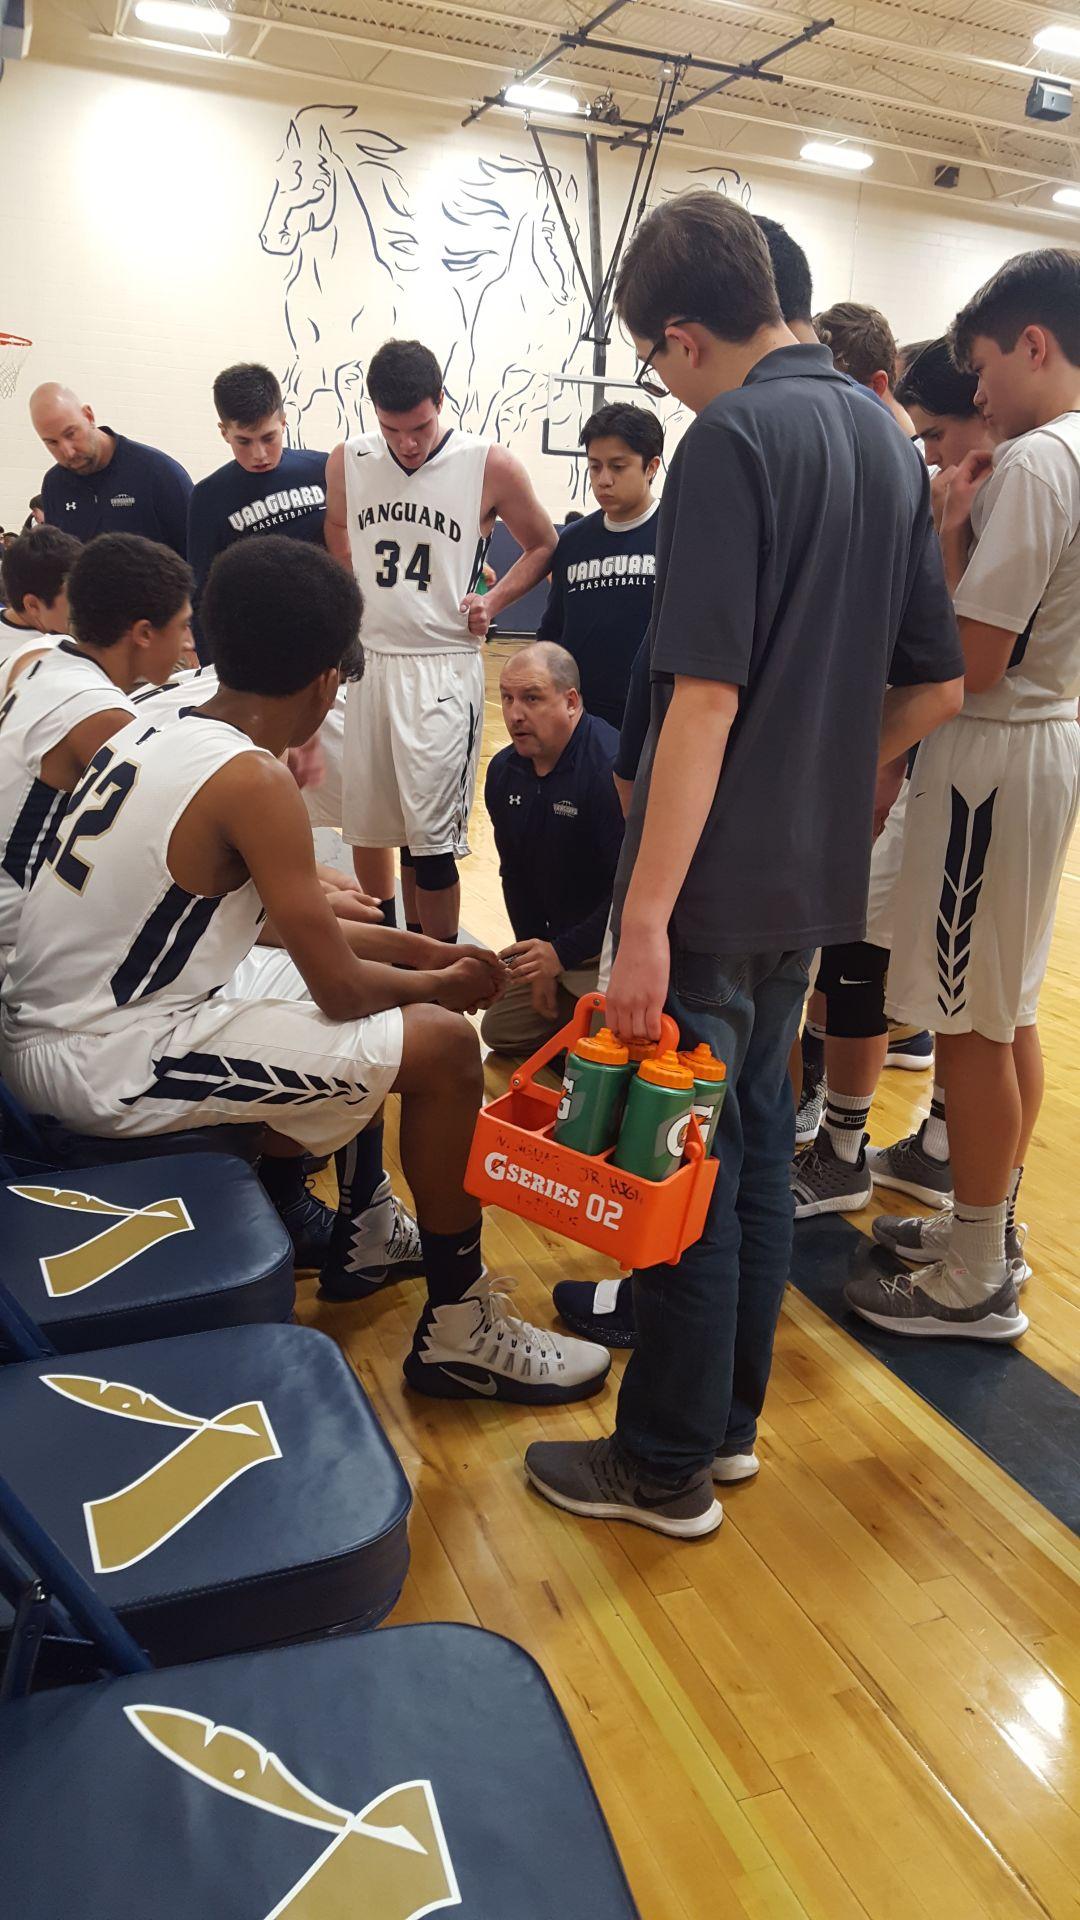 Vanguard coach Joe Wetters